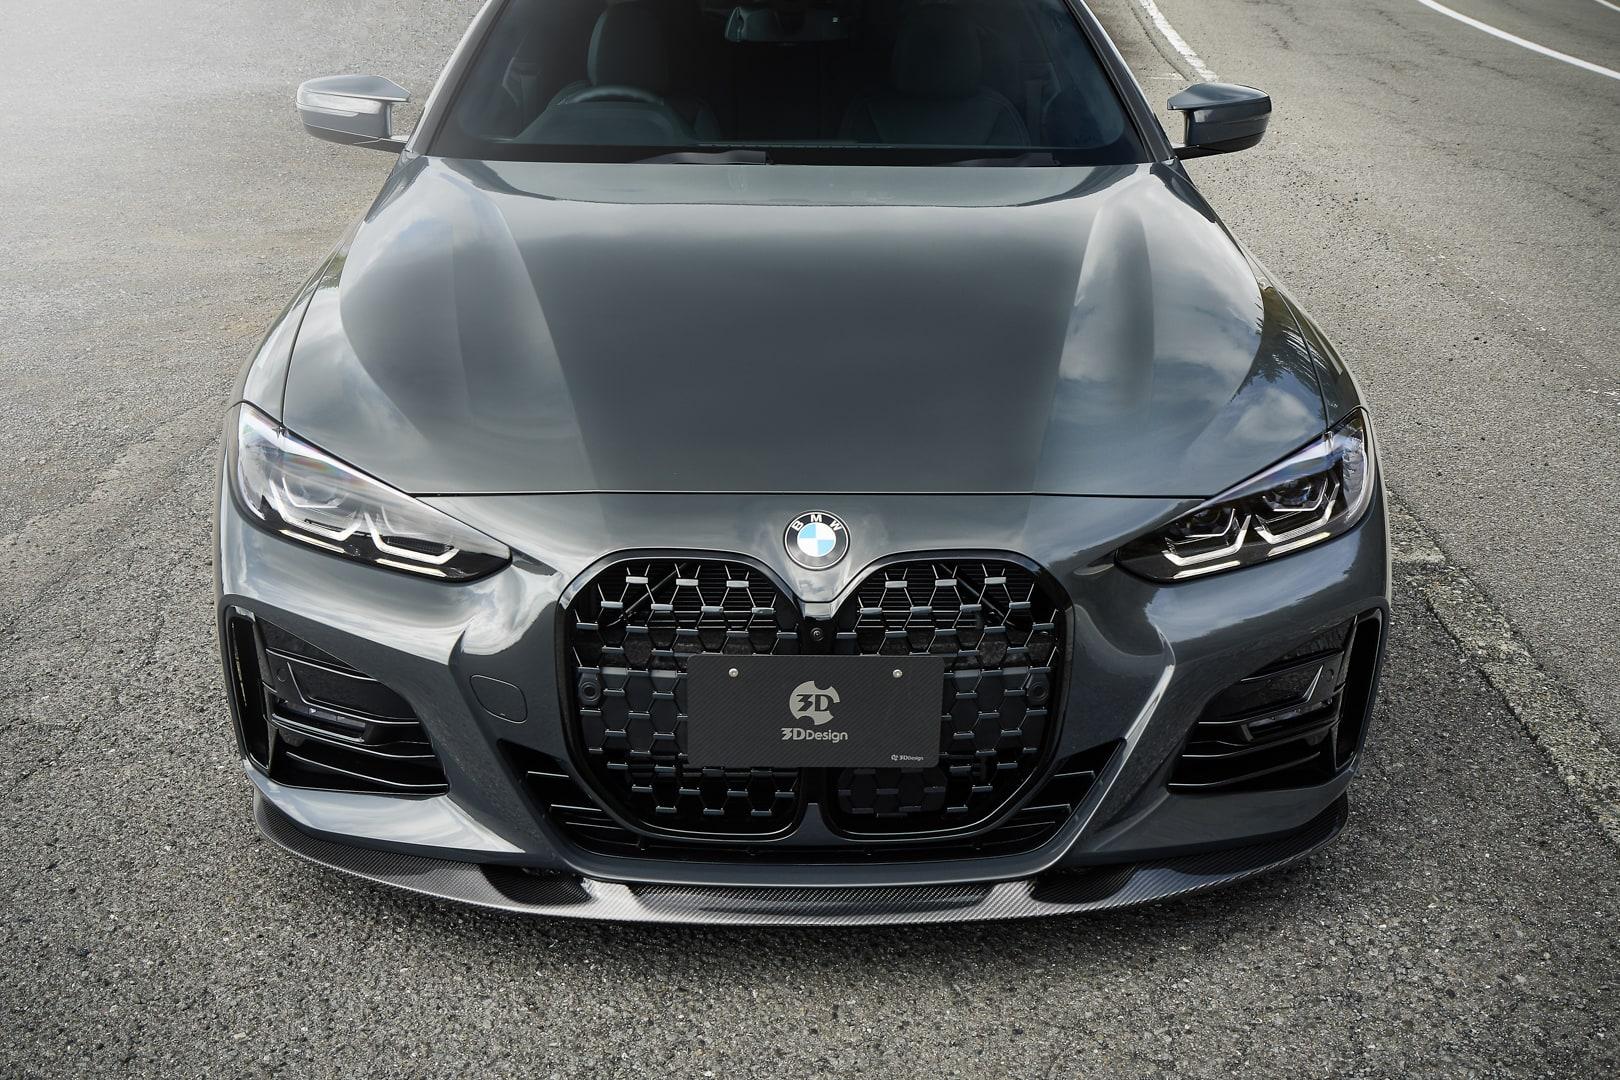 BMW-4-Series-by-3D-Design-21